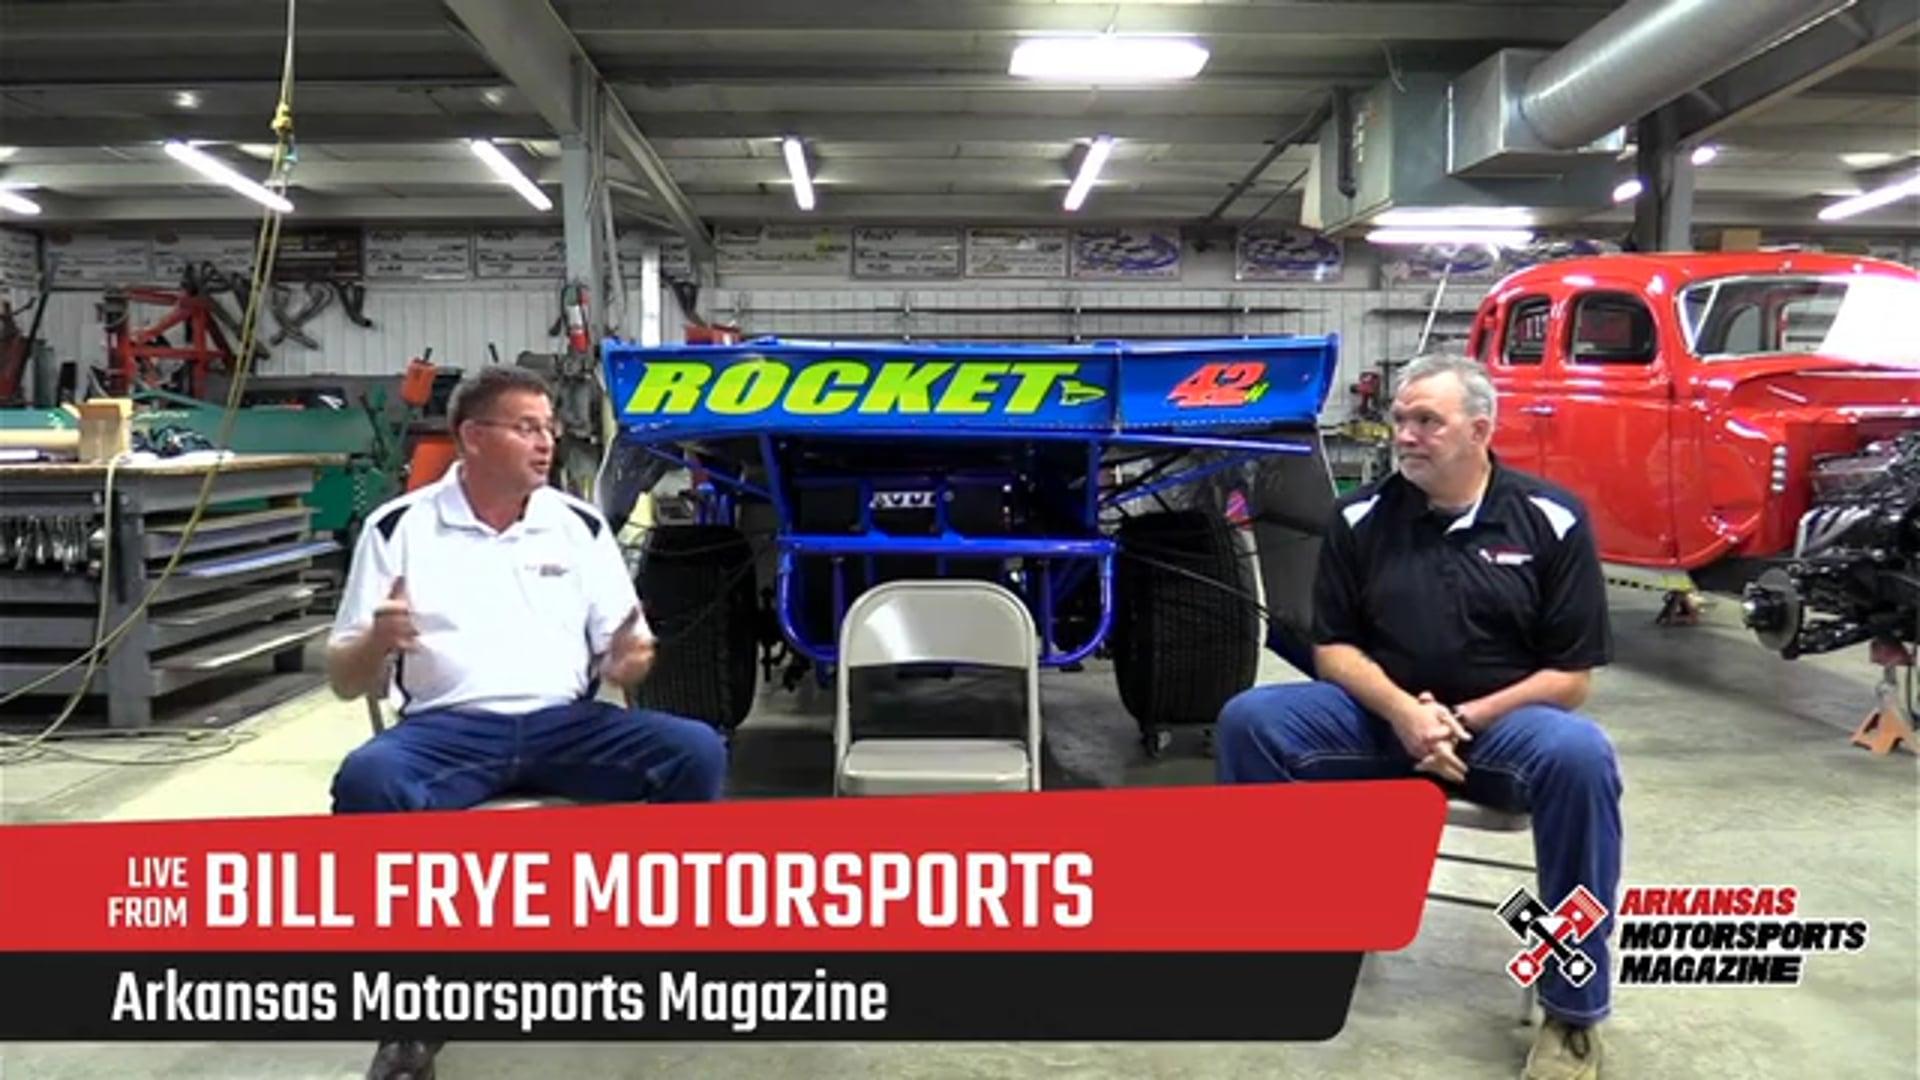 TUESDAY NIGHT TUNE UP - S1 E3 -  Guy Arkansas at Bill Frye Motorsports